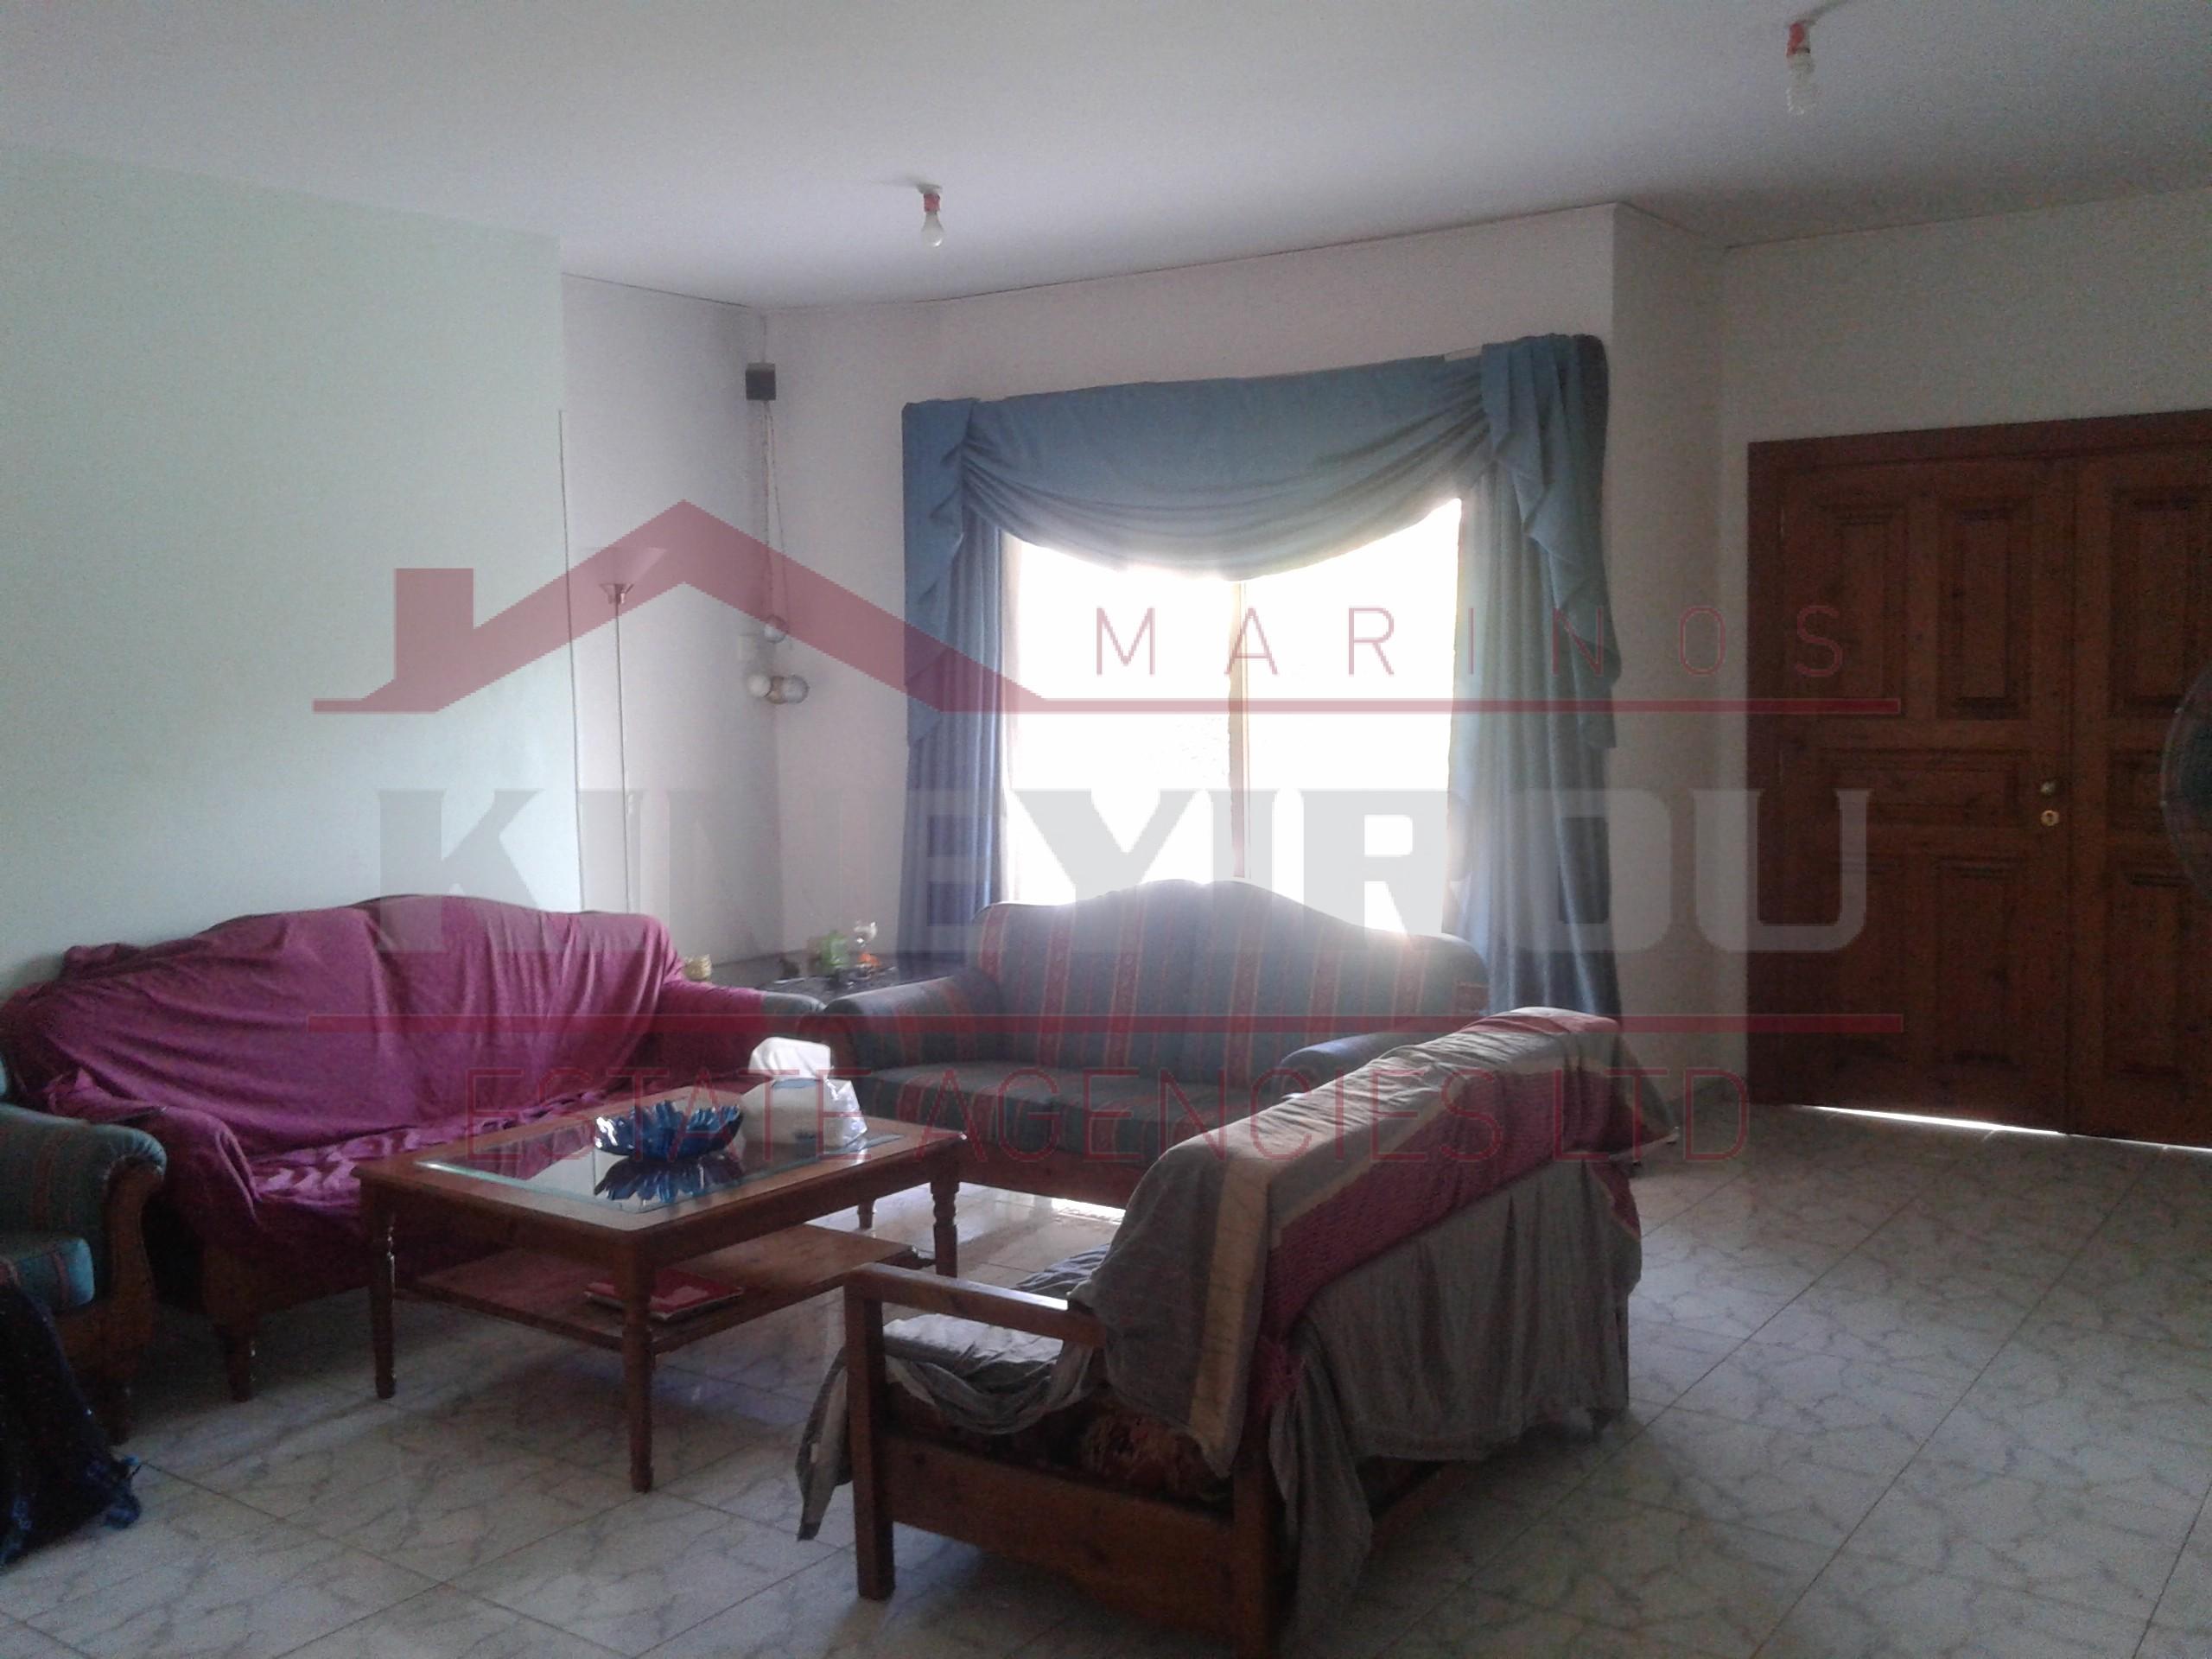 3 bedroom house  near Salamina Stadium , Larnaca